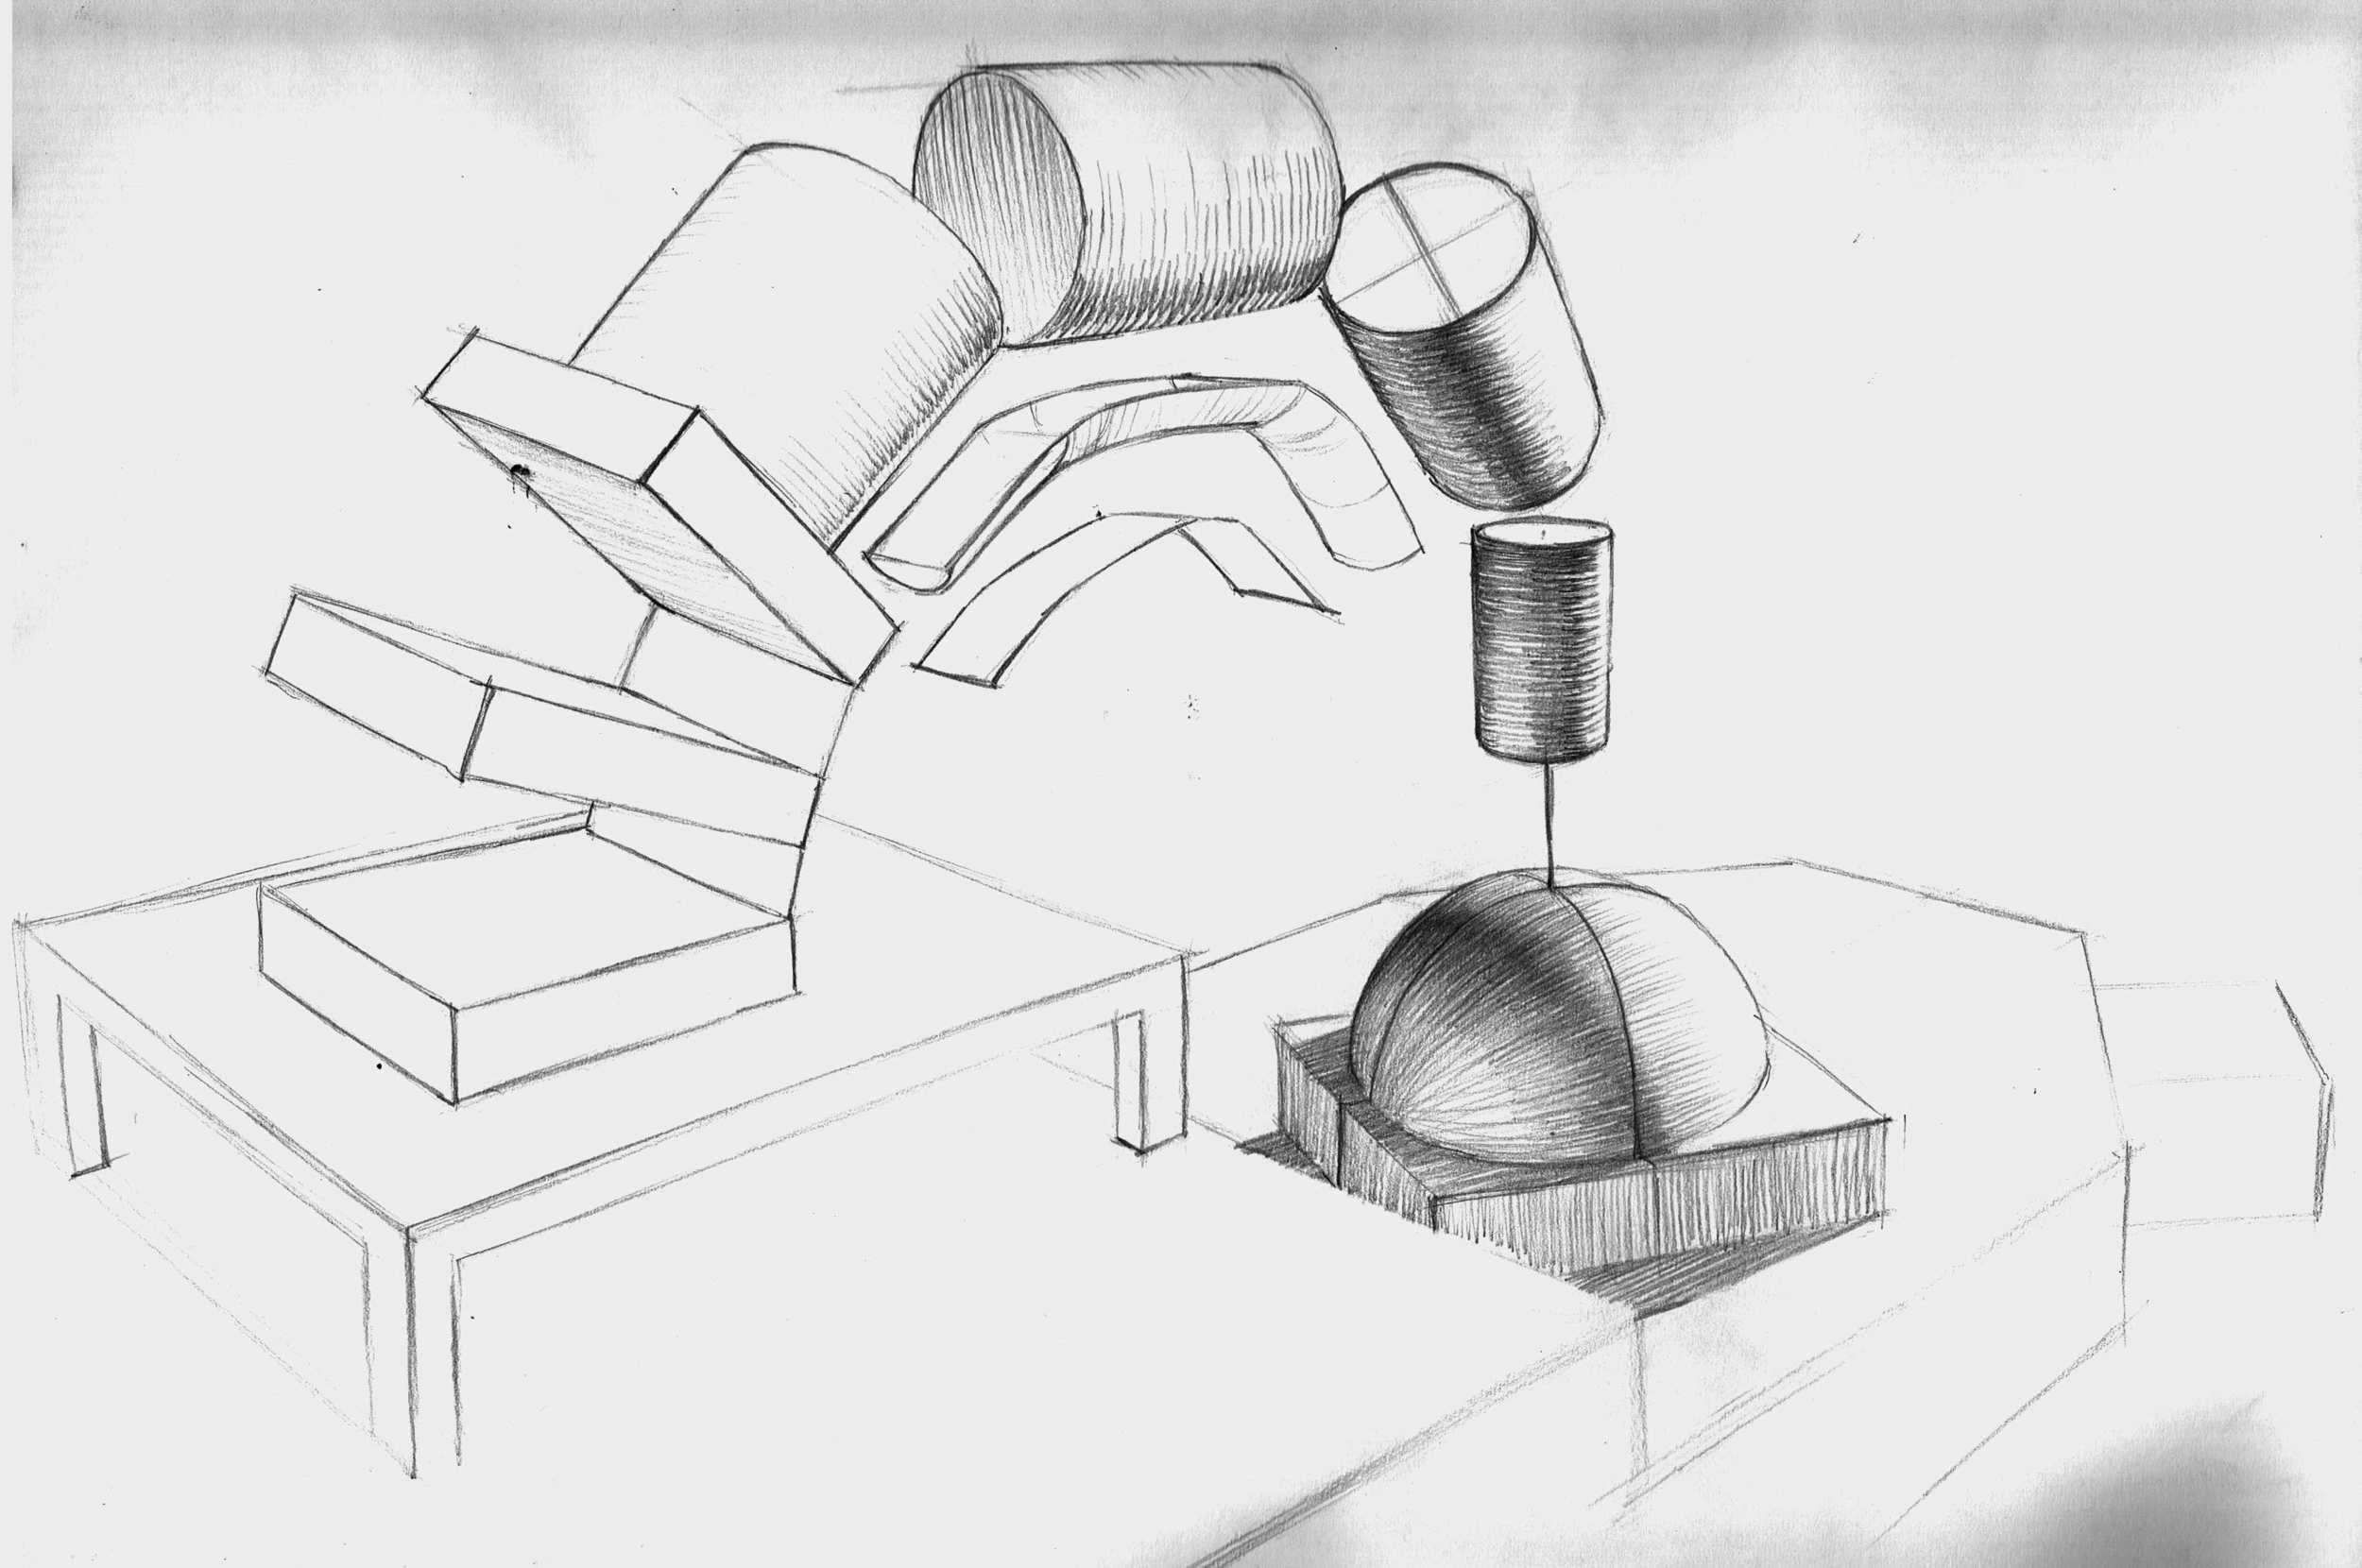 basic form drawing scans 3.jpg